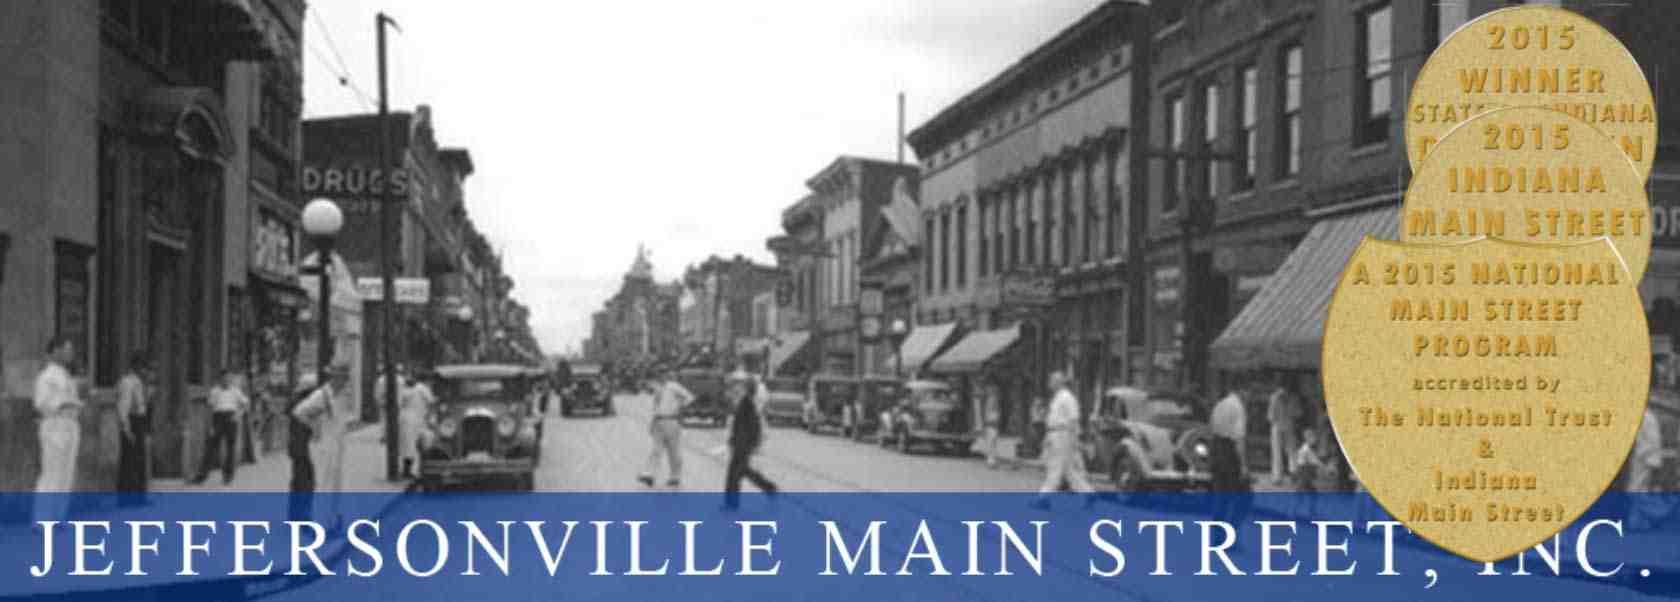 Vintage Main Street Jeffersonville